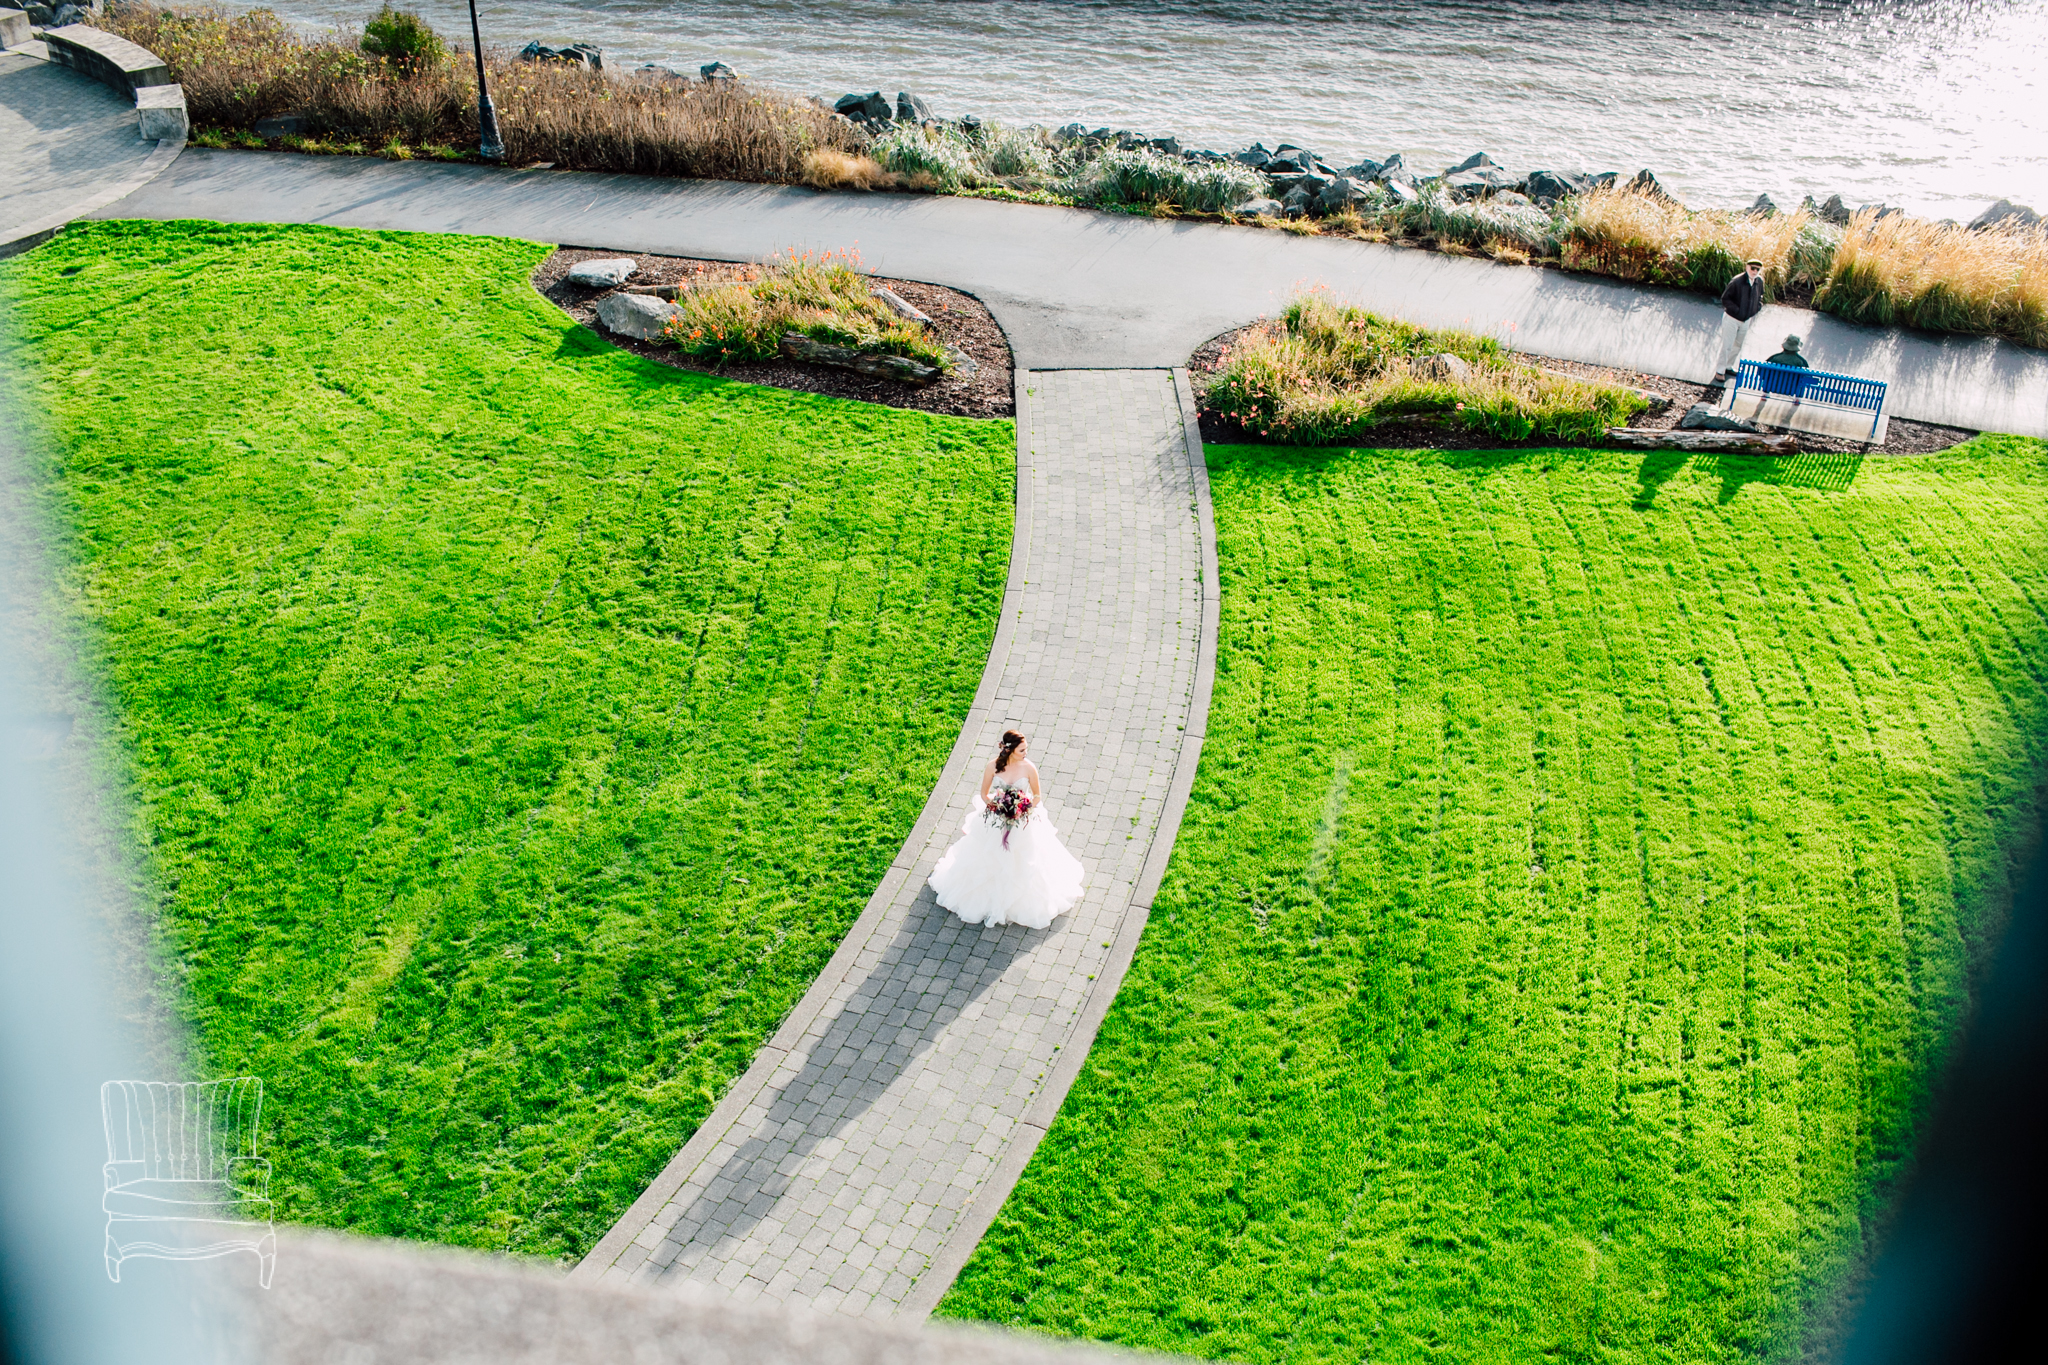 bellwether-hotel-bellingham-wedding-photographer-katheryn-moran-glitz-glam-styled-388.jpg